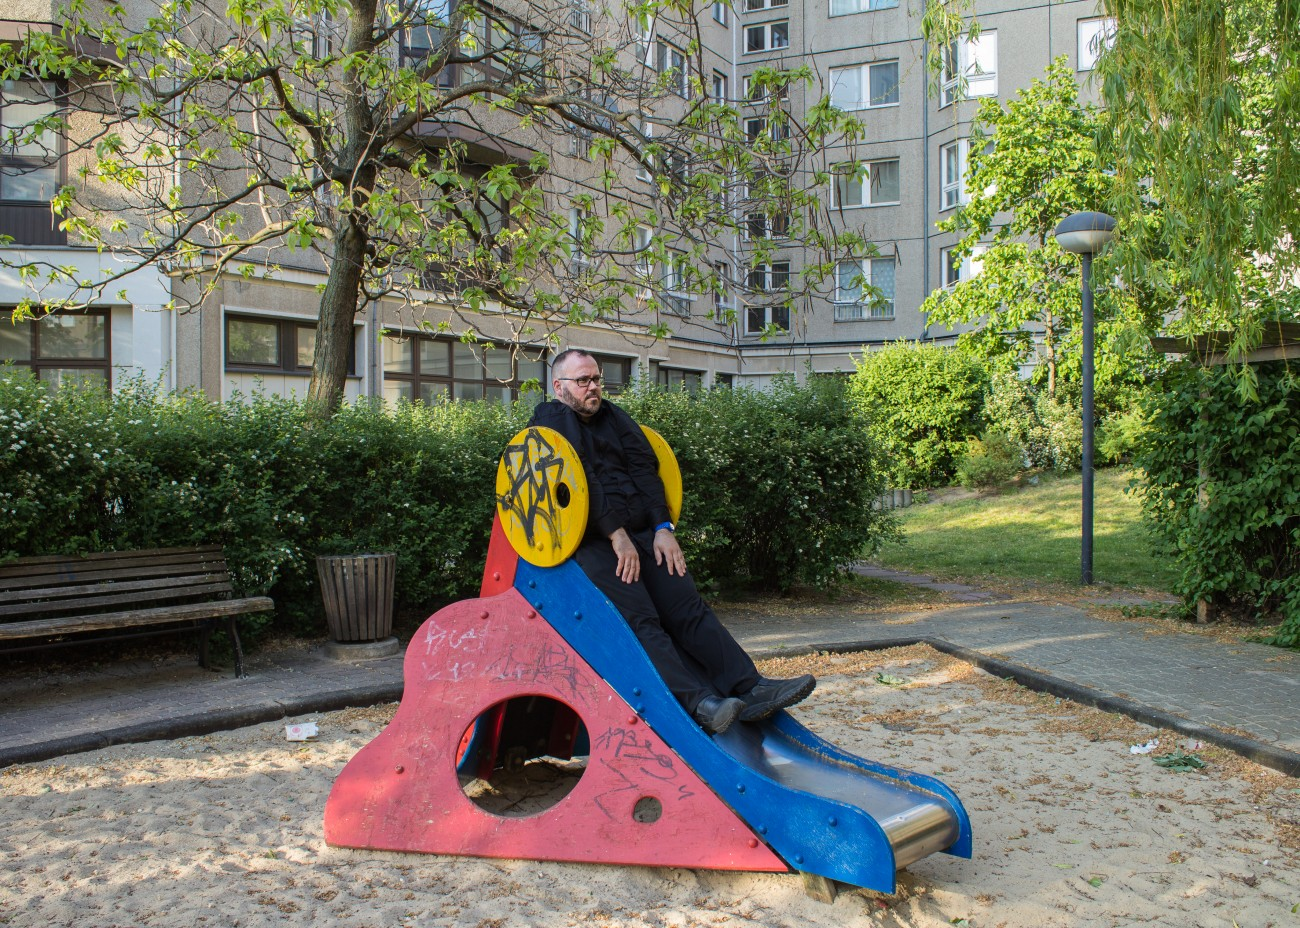 Steve Giasson. Performance invisible n° 113 (Attendre la guerre). Performeur : Steve Giasson. Crédit photographique : Martin Vinette. Führerbunker, Berlin. 15 mai 2016.